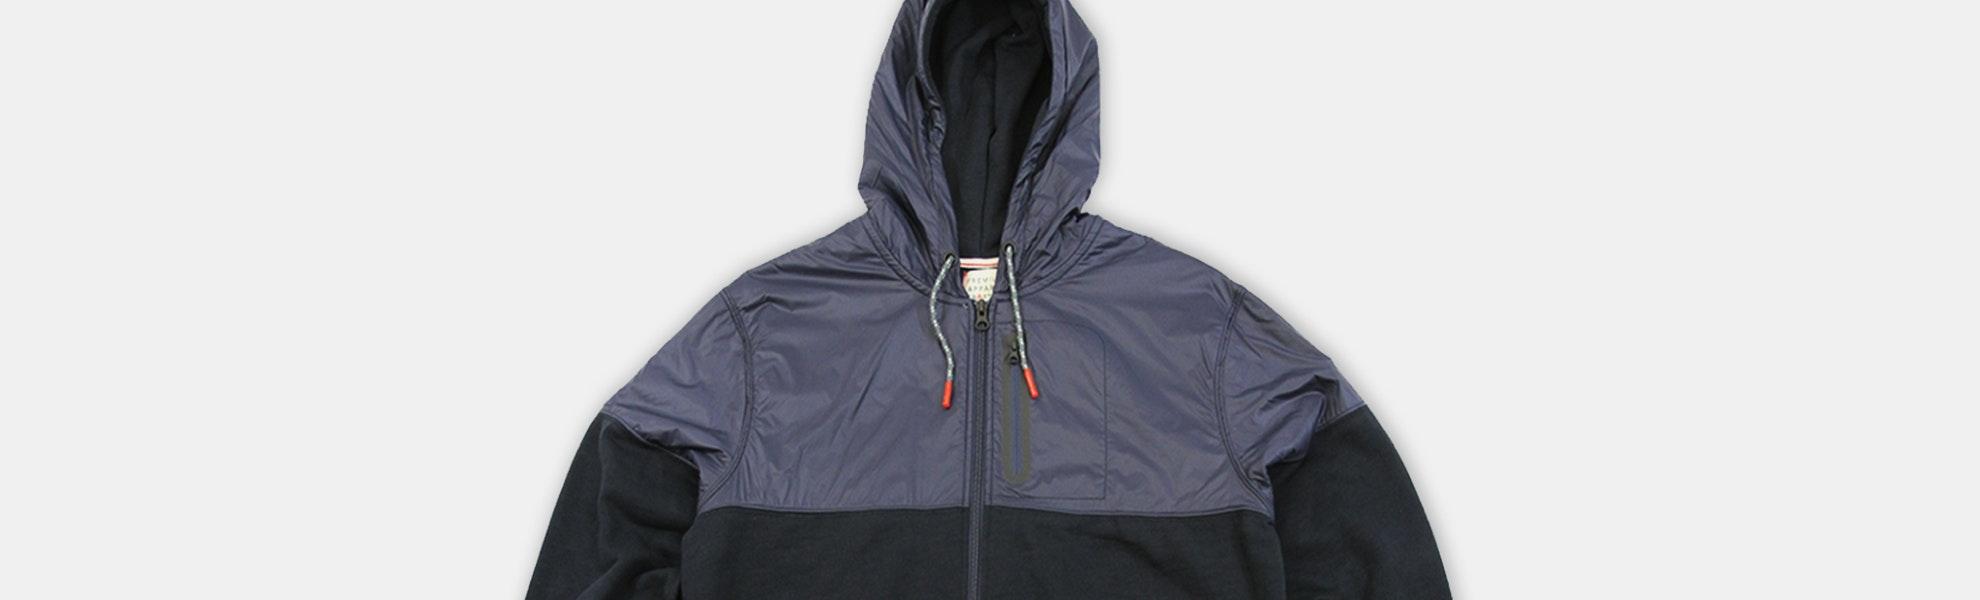 P.A.C. Clothing Traveler Hoodie